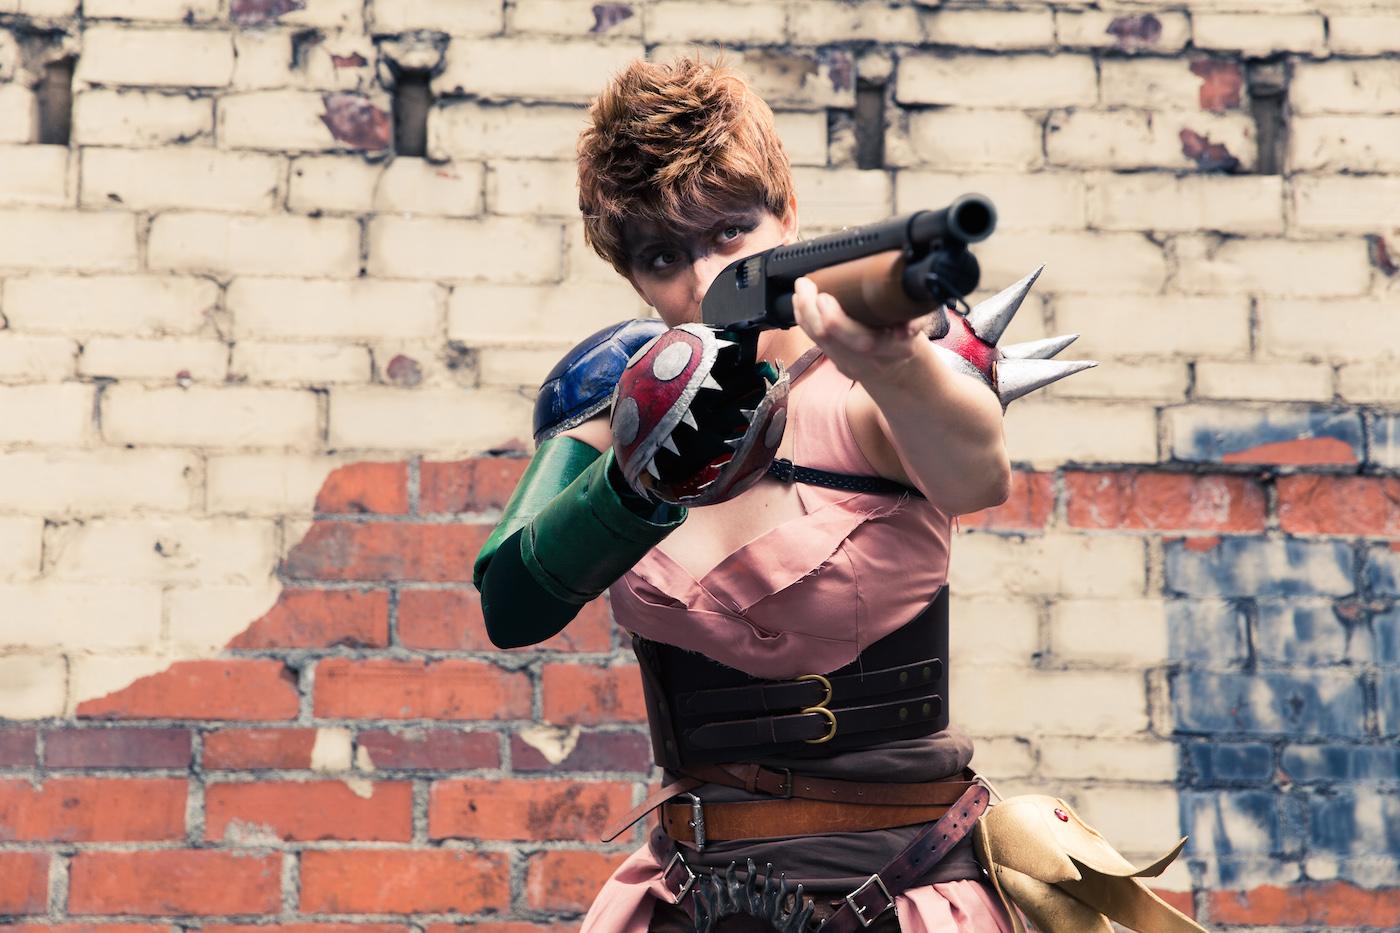 mad-max-fury-road-furiosa-and-princess-peach-cosplay-mashup-imperator-peachiosa1.jpeg